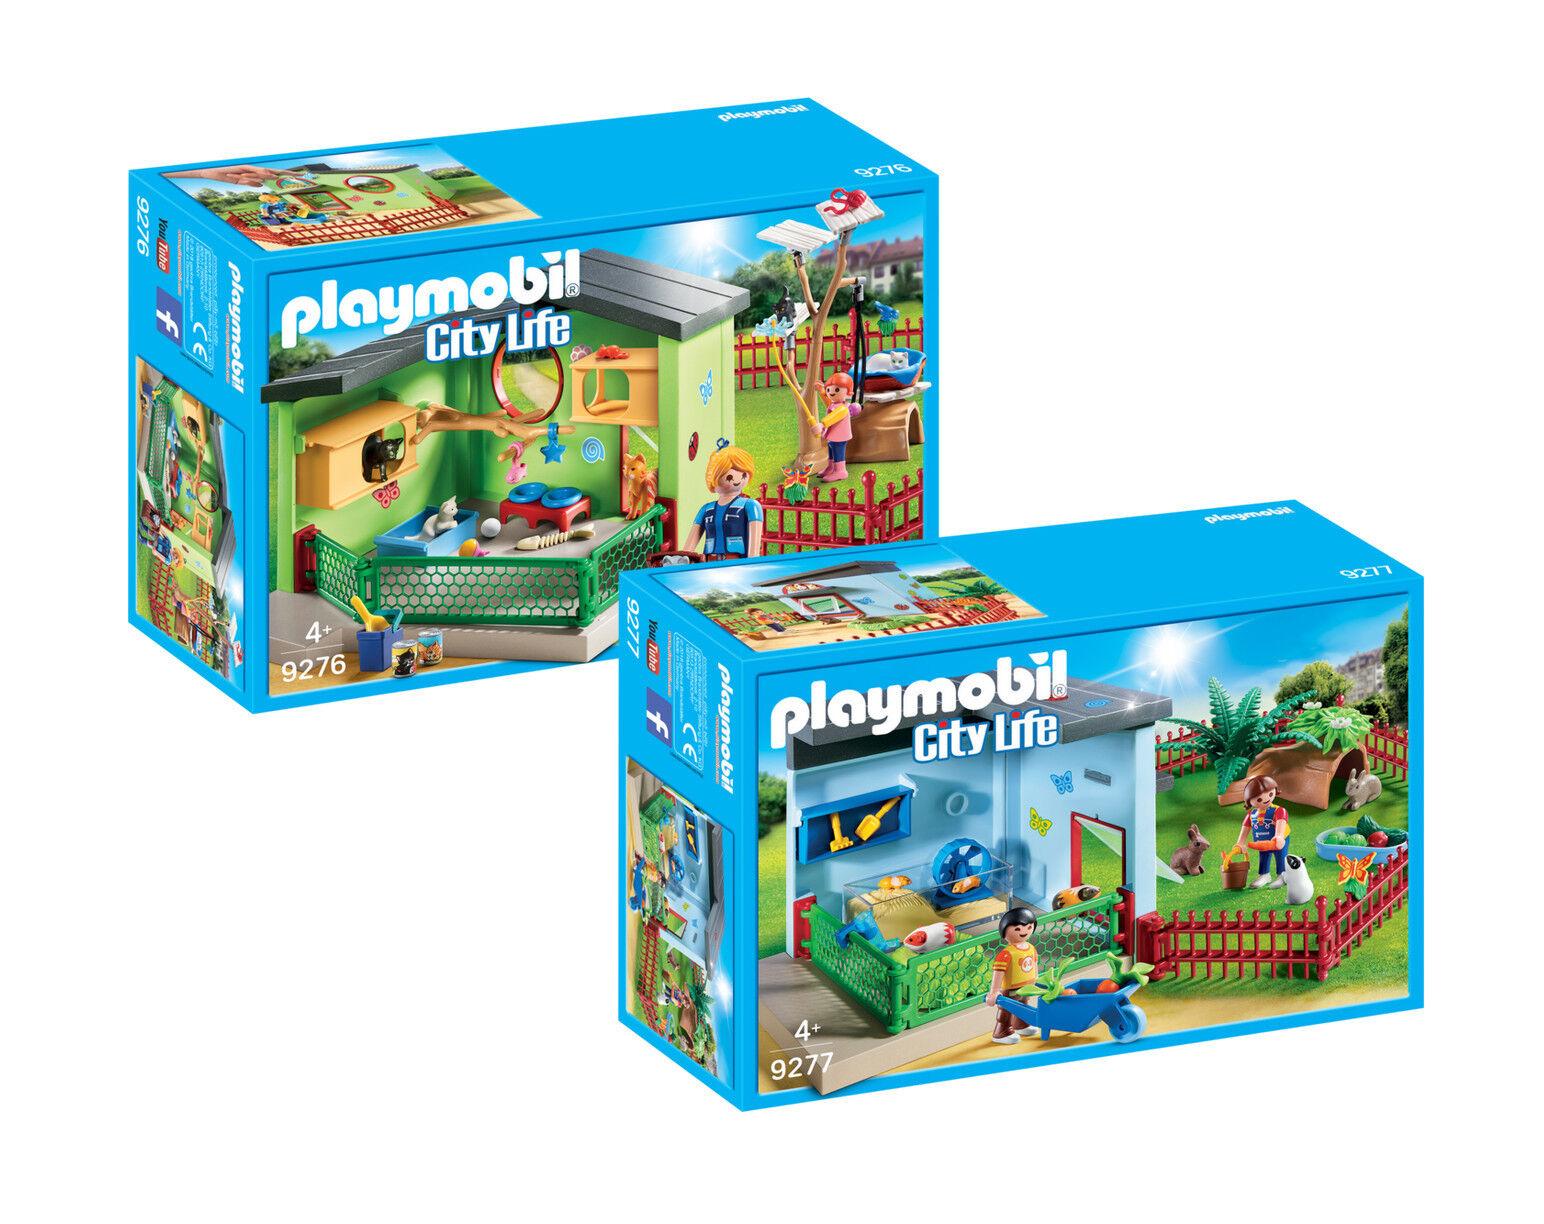 PLAYMOBIL ® per 9275 Hotel animali 2 pezzi Ergänzungsset: 9276 + 9277, Nuovo, Confezione Originale